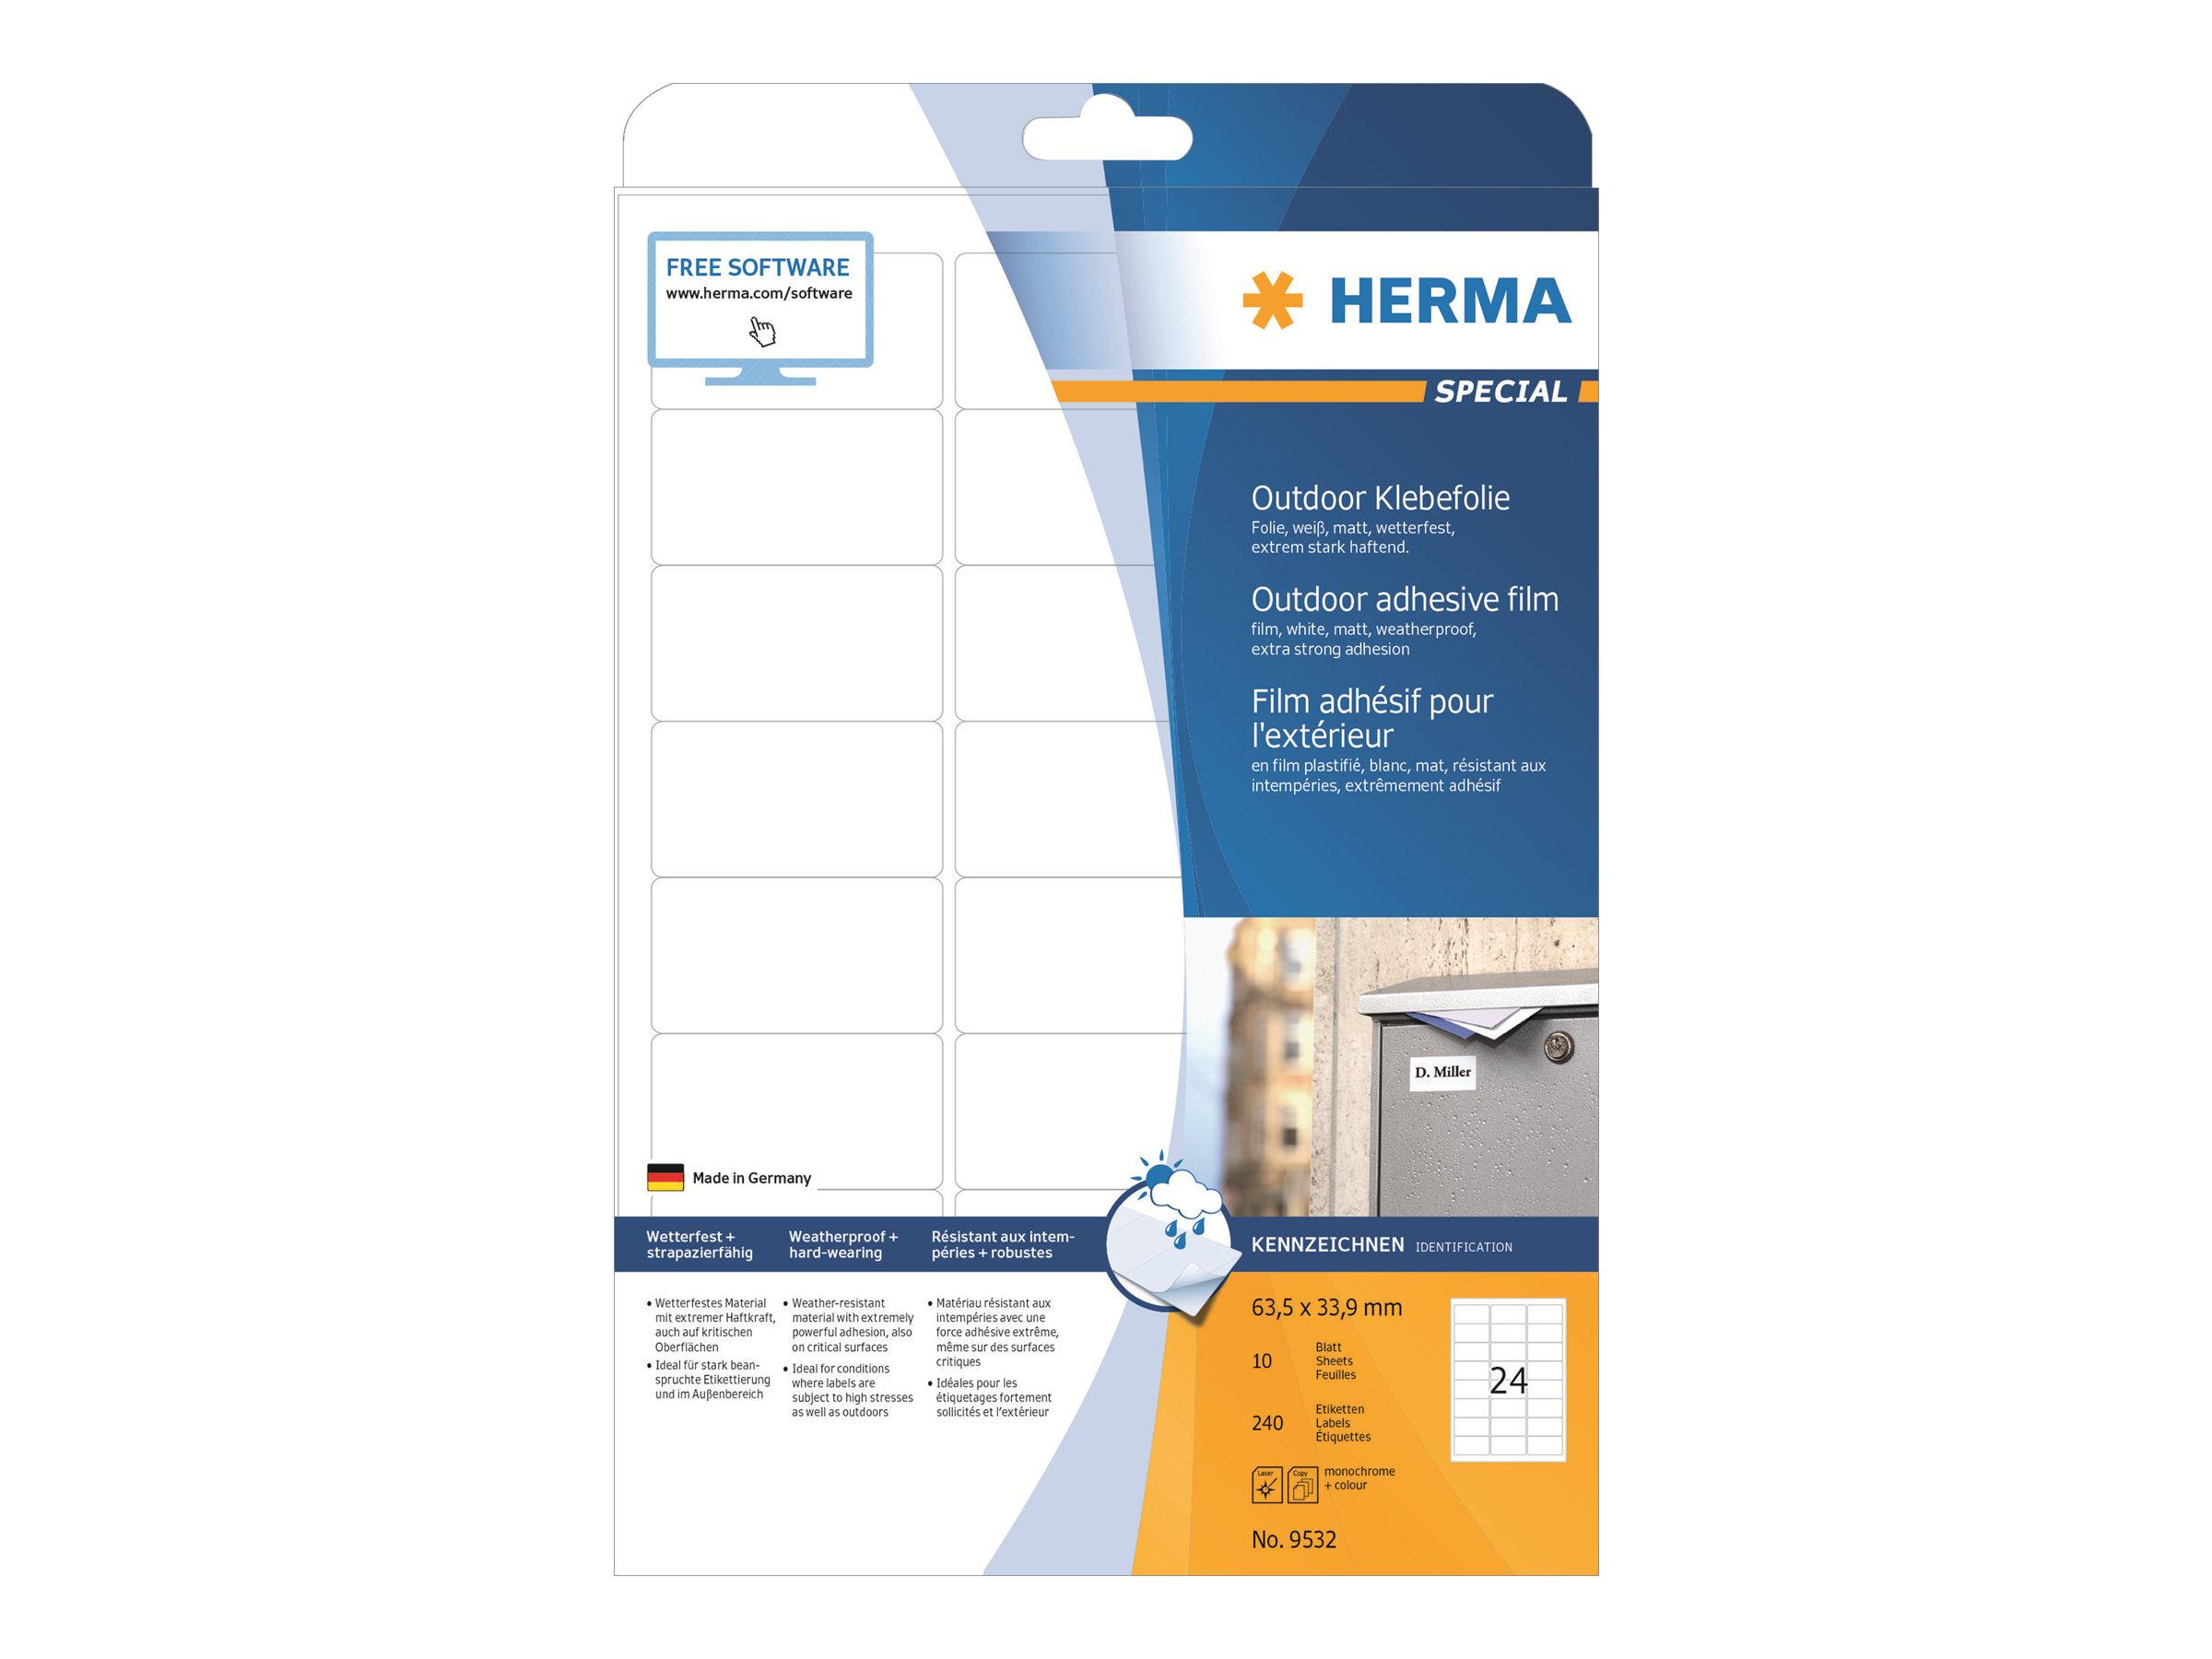 HERMA Special - Polyethylen (PE) - matt - selbstklebend - weiß - 63.5 x 33.9 mm 240 Etikett(en) (10 Bogen x 24)